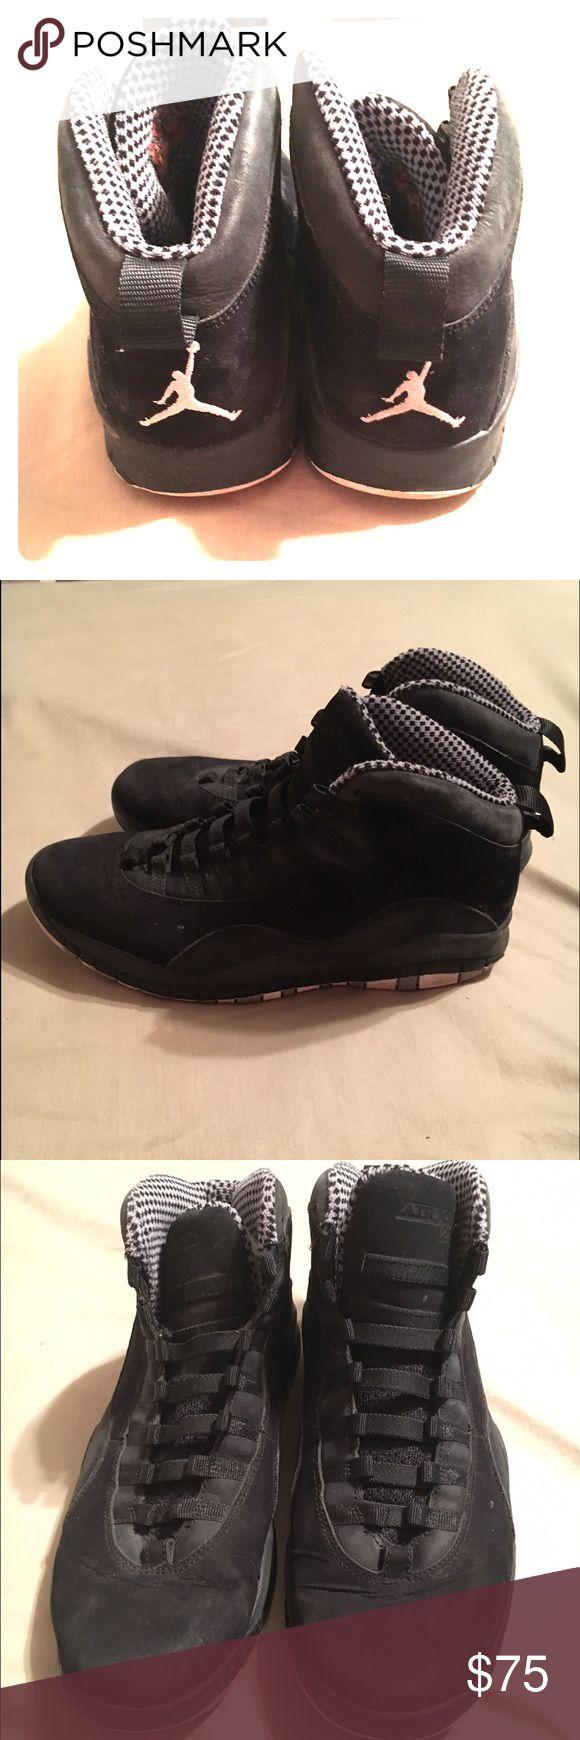 Authentic Jordan Retro 10's All black Retro 10's, good condition. No laces, fit tight. Jordan Shoes Sneakers